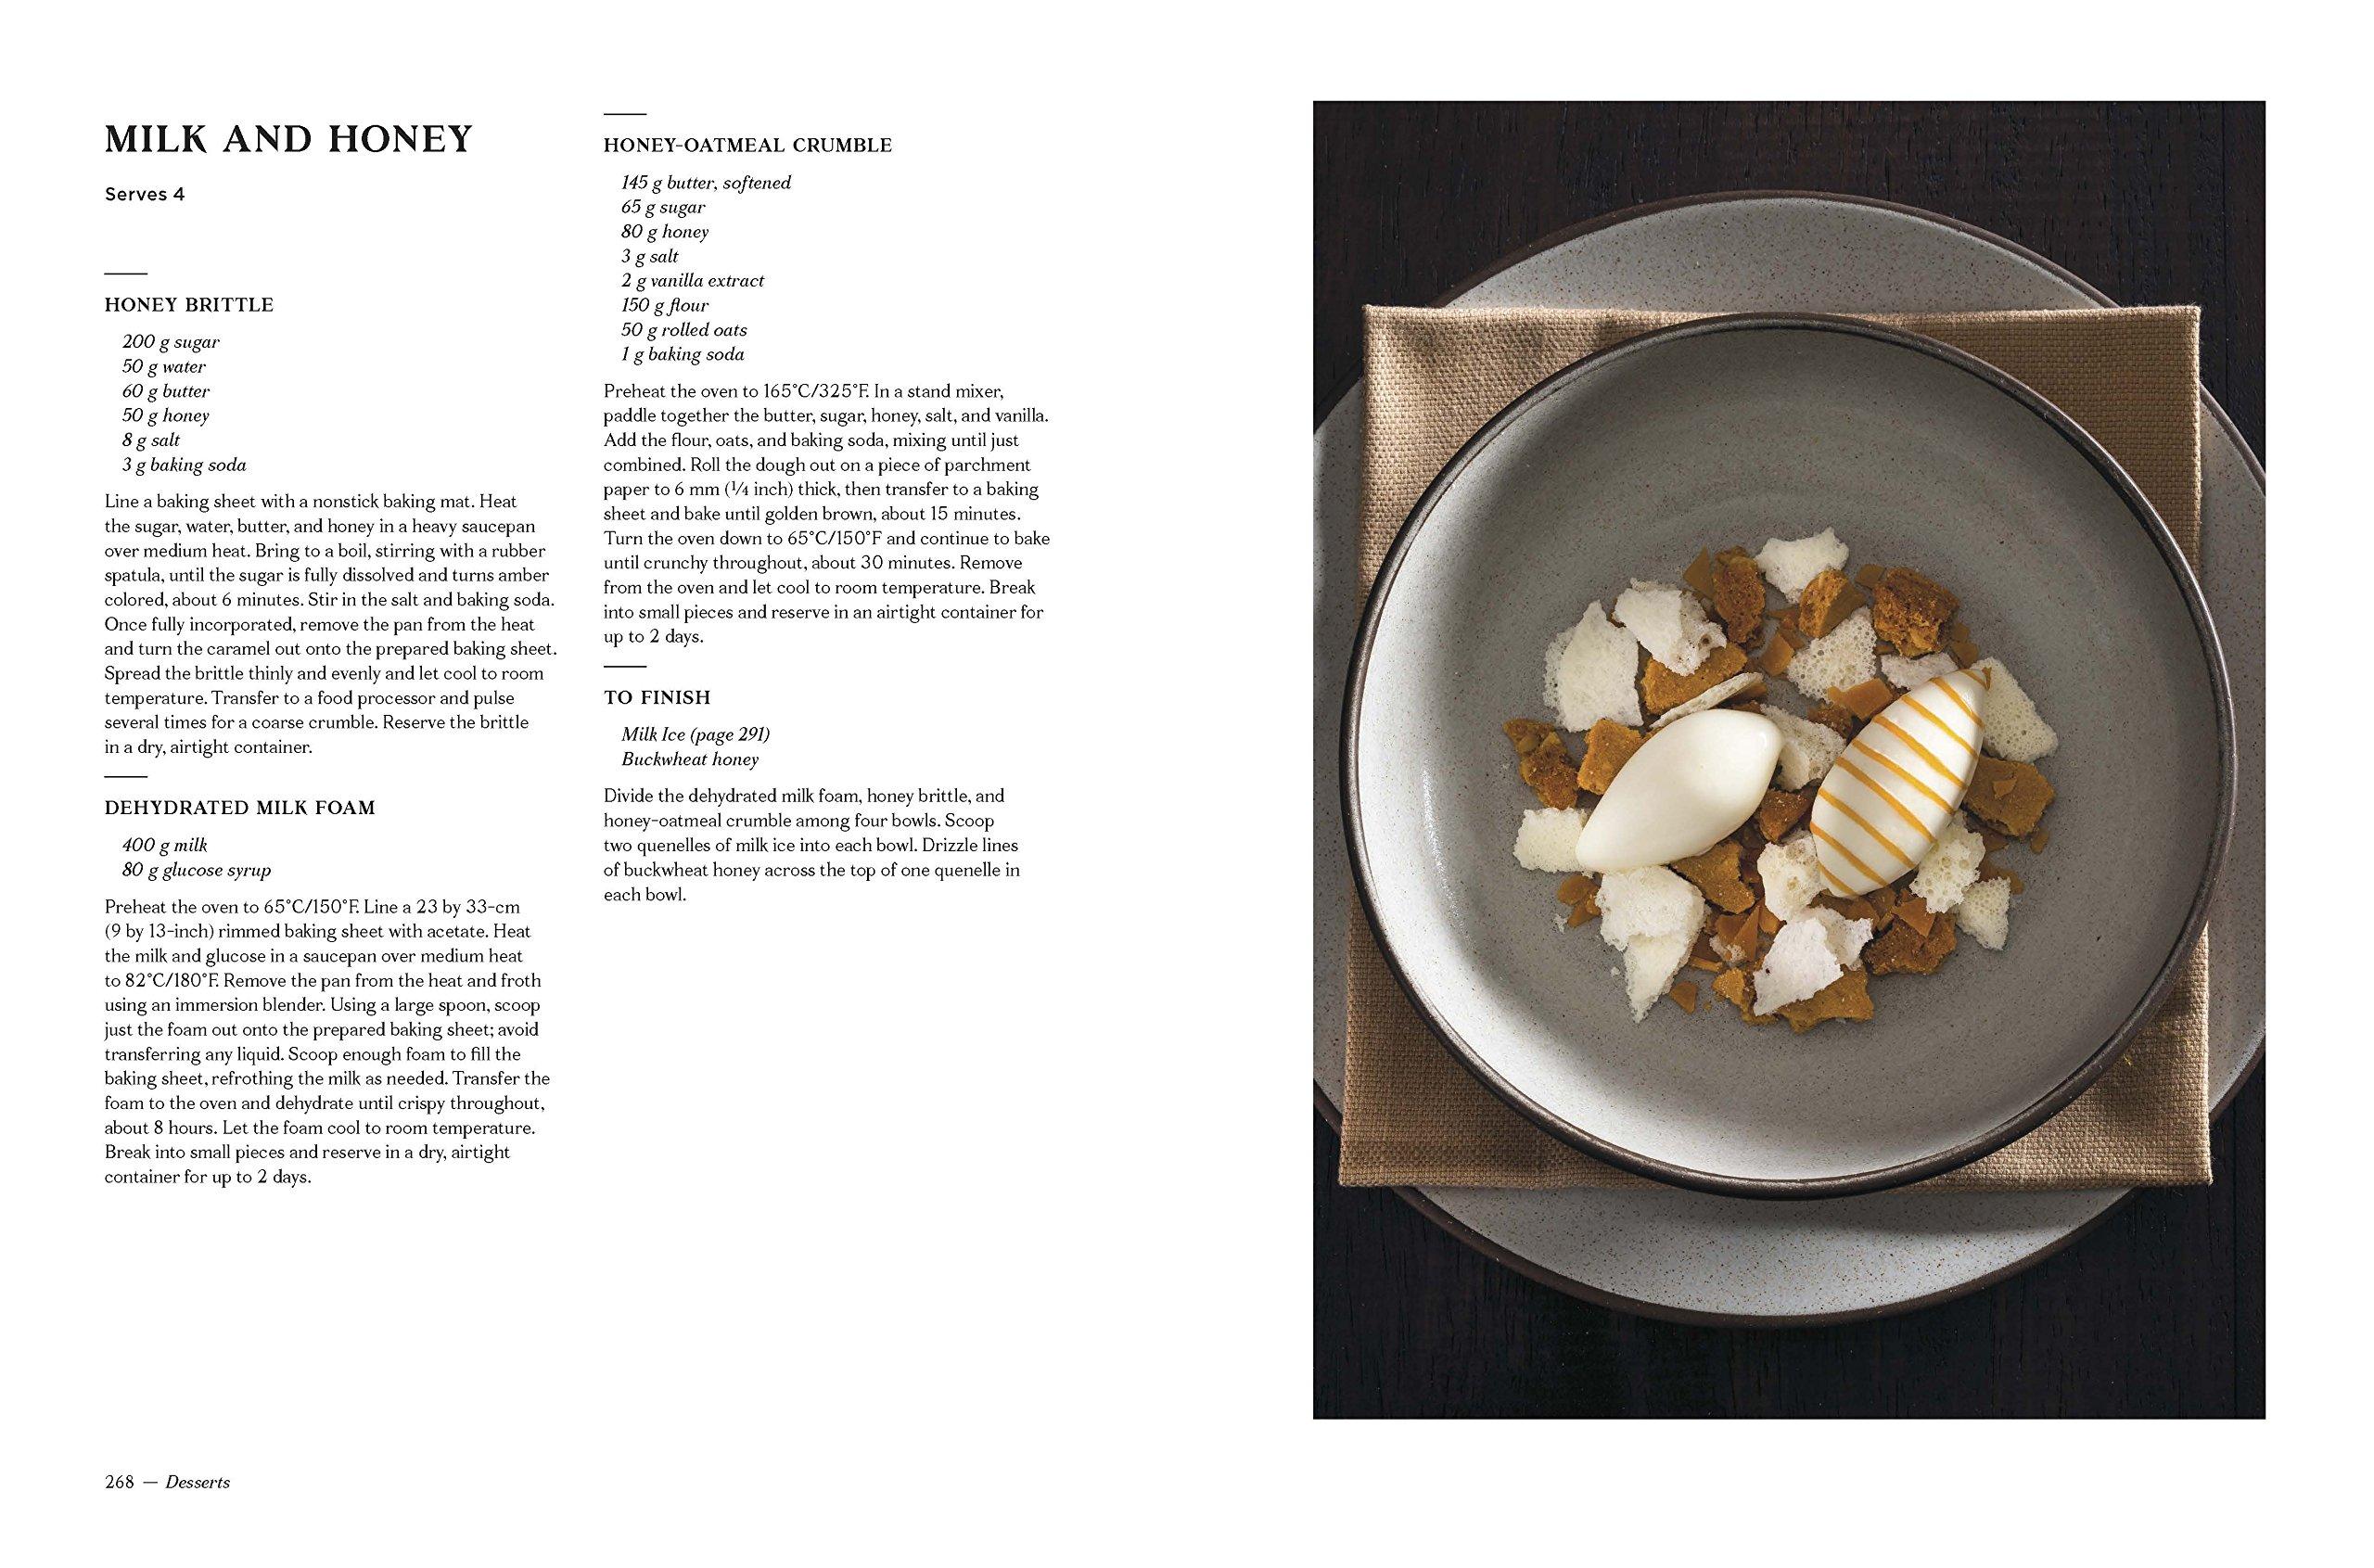 The nomad cookbook daniel humm will guidara leo robitschek the nomad cookbook daniel humm will guidara leo robitschek francesco tonelli 0787721912392 amazon books forumfinder Choice Image